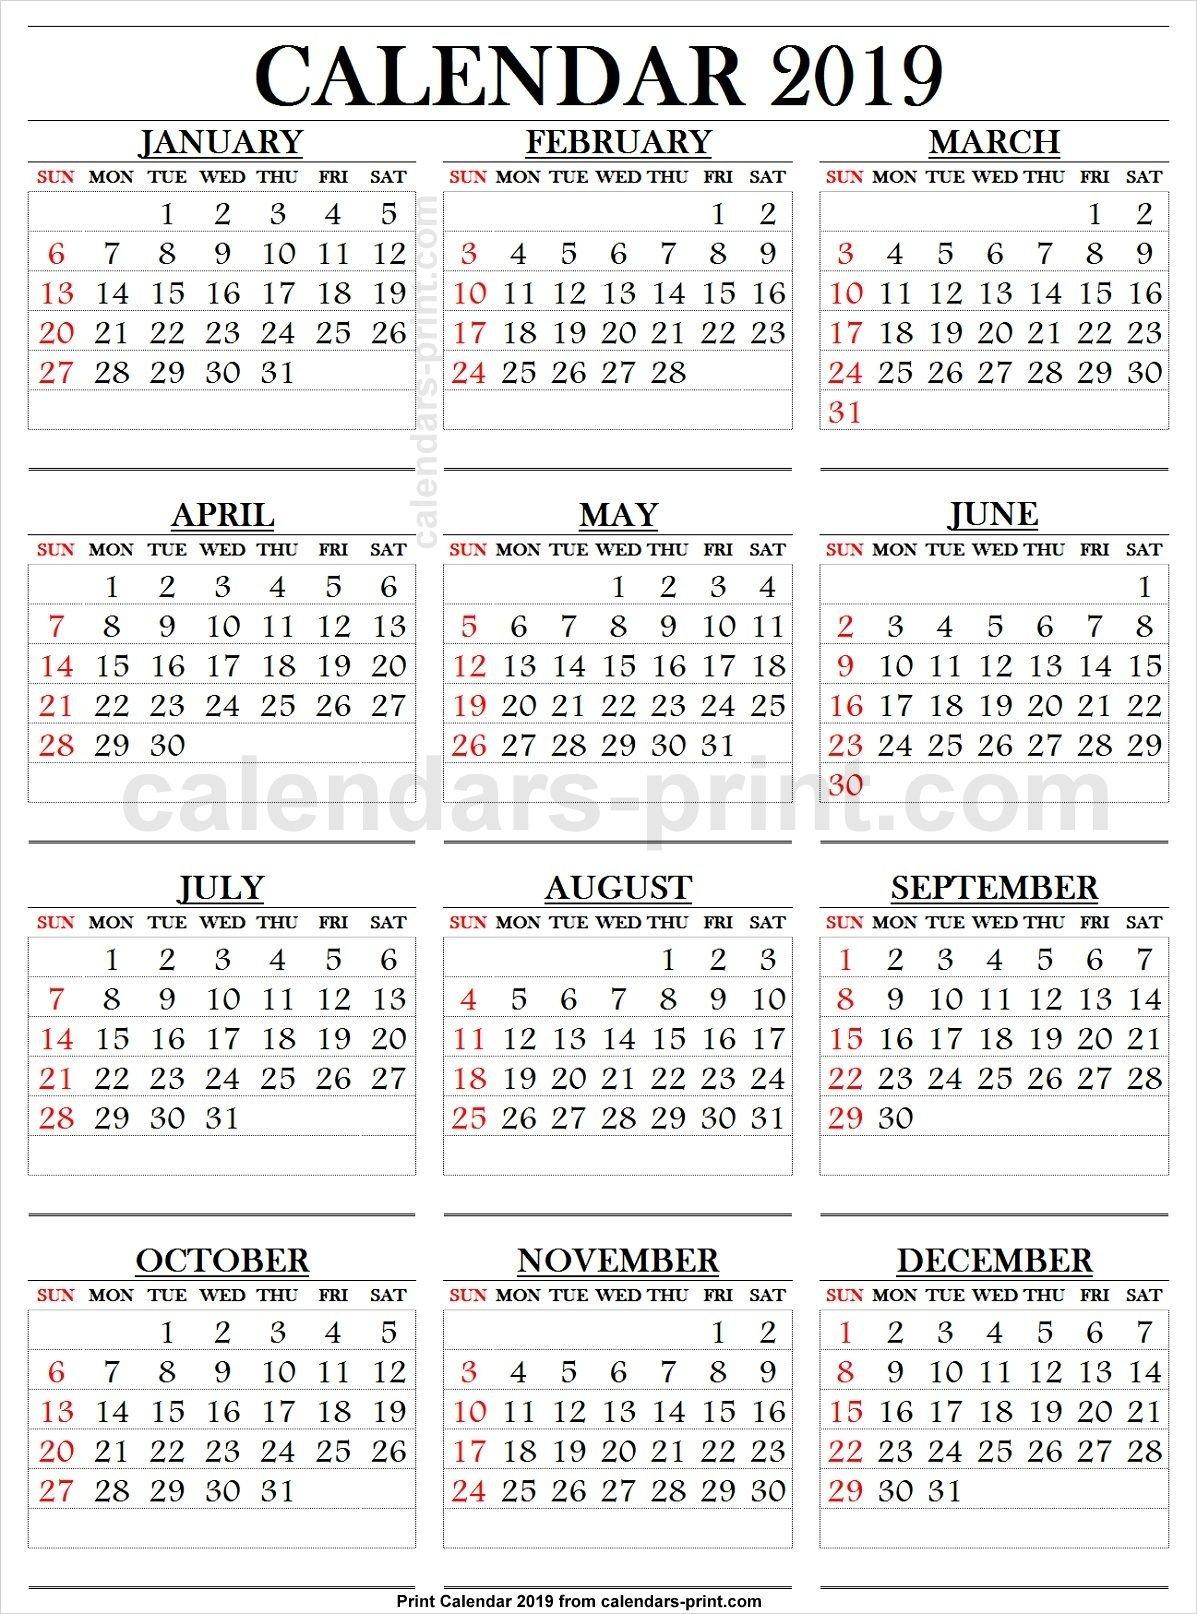 2019 Calendar Large Numbers | 2019 Yearly Calendar | 2019 Calendar Calendar 2019 Large